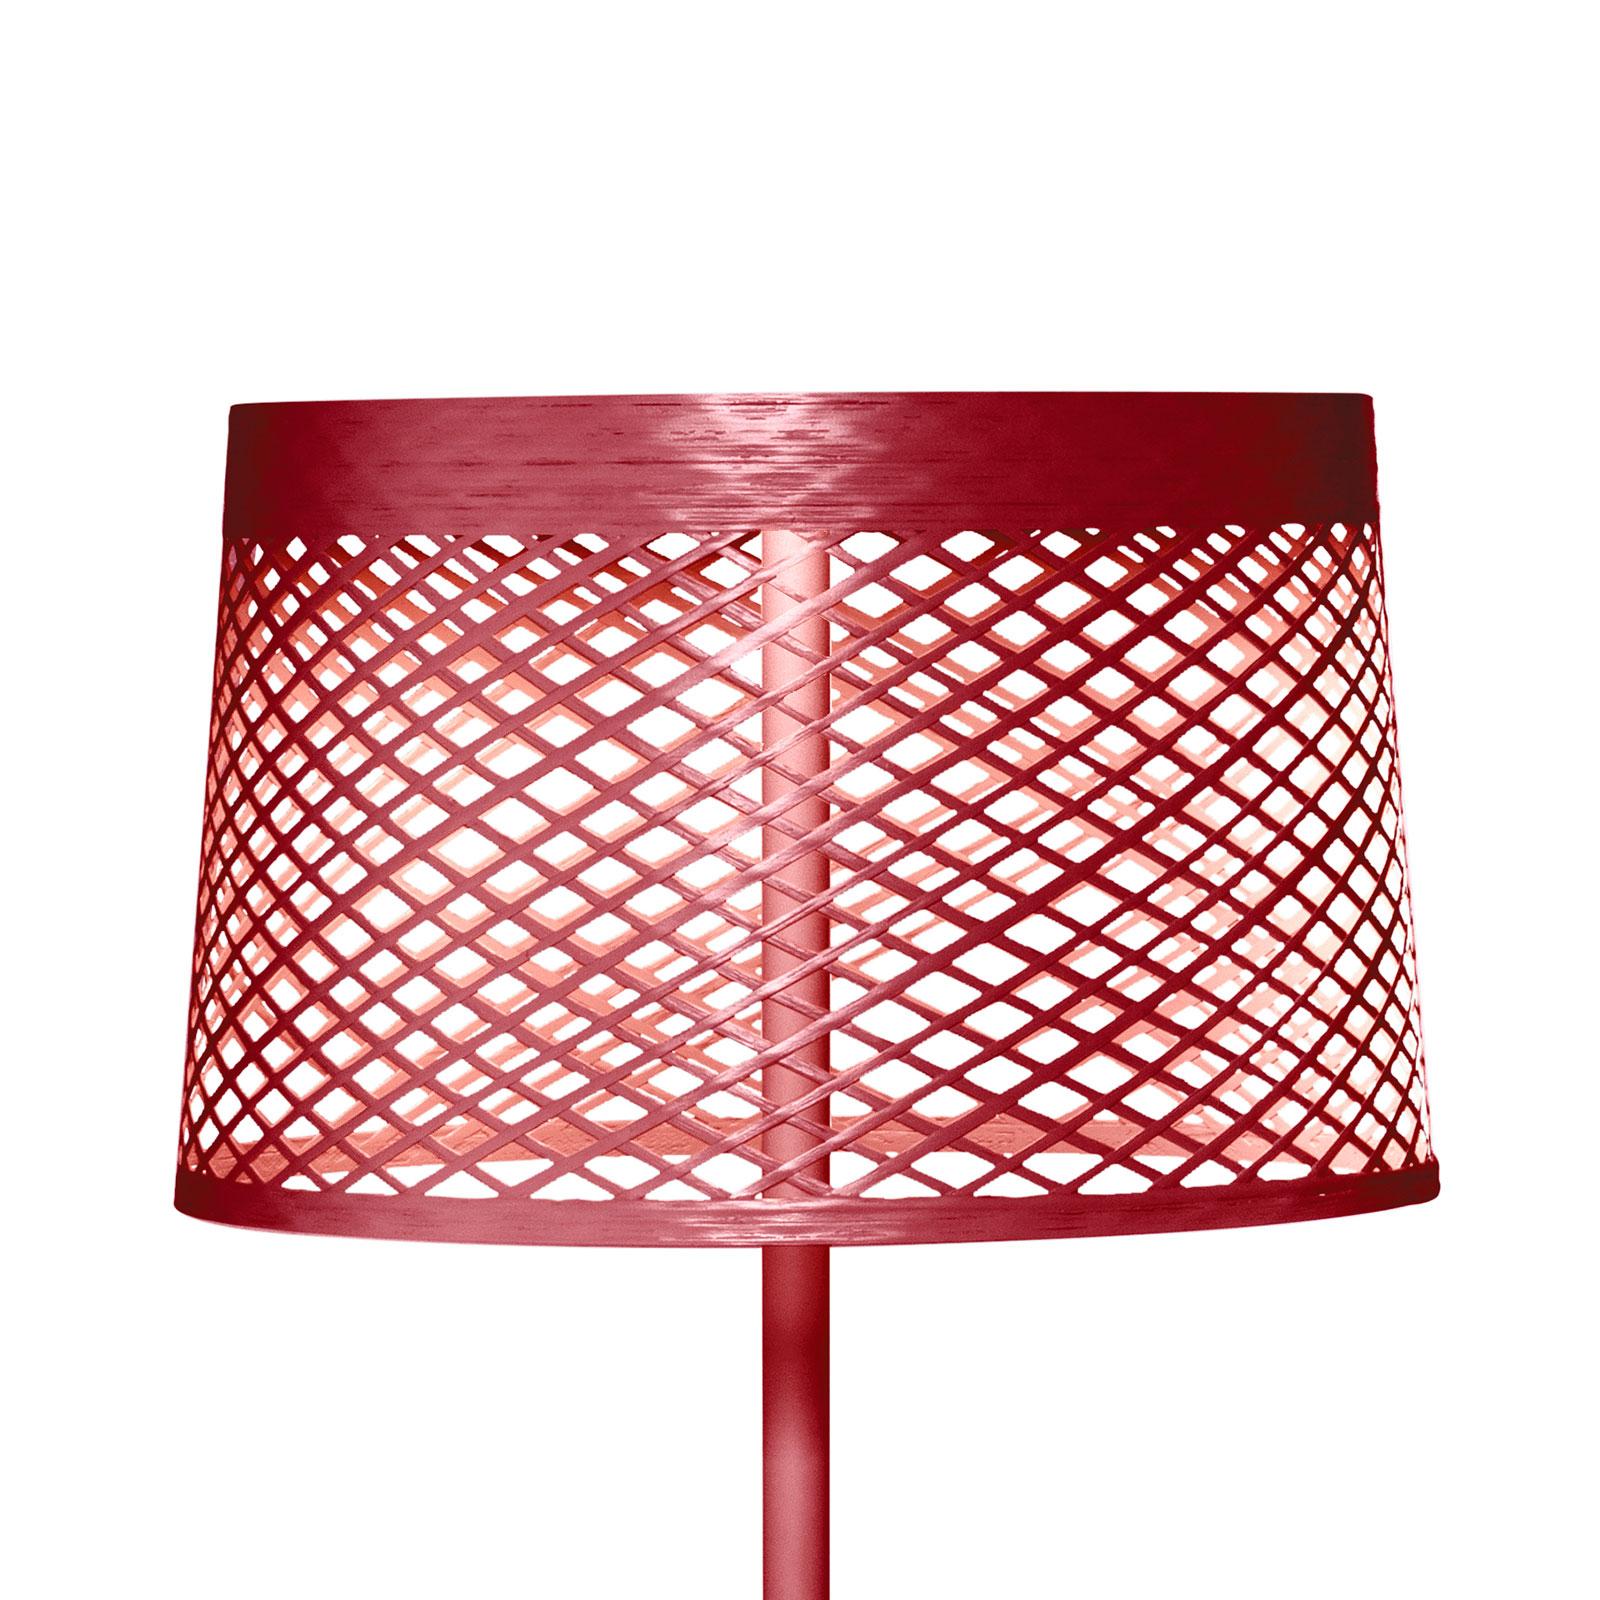 Foscarini Twiggy Grid lettura Stehlampe, karminrot